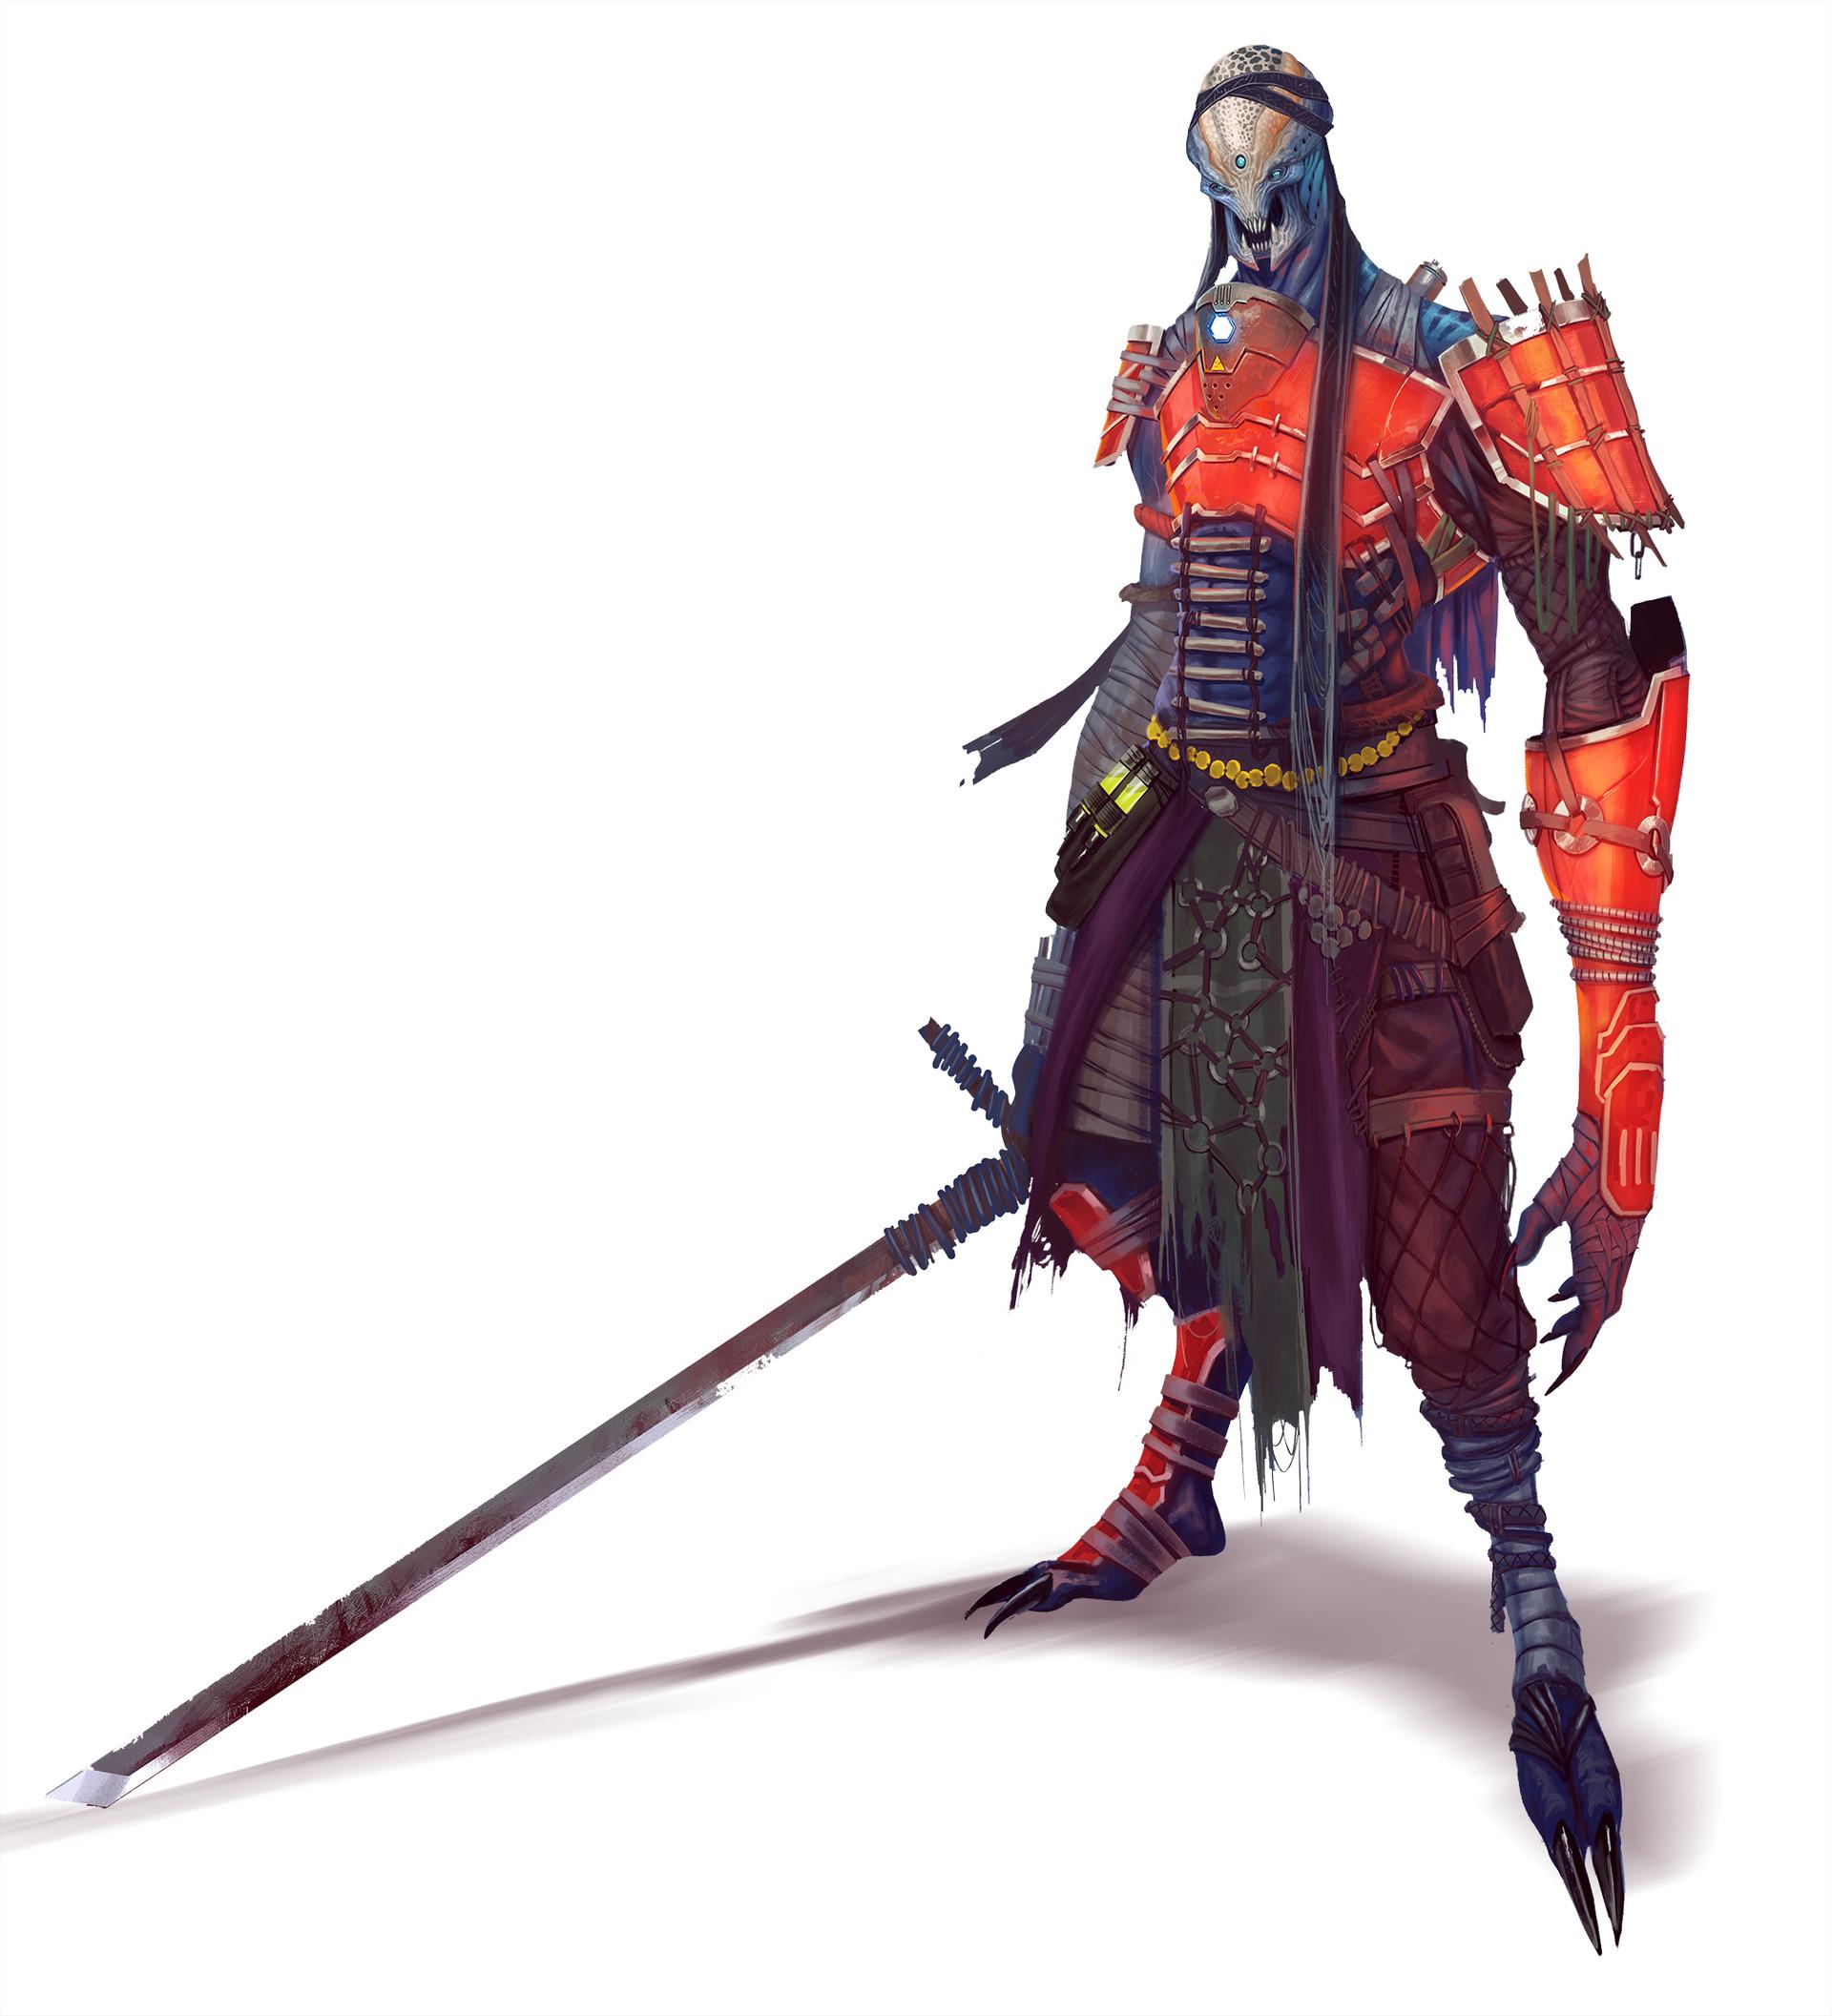 David alvarez pzo7204 kish warlord f